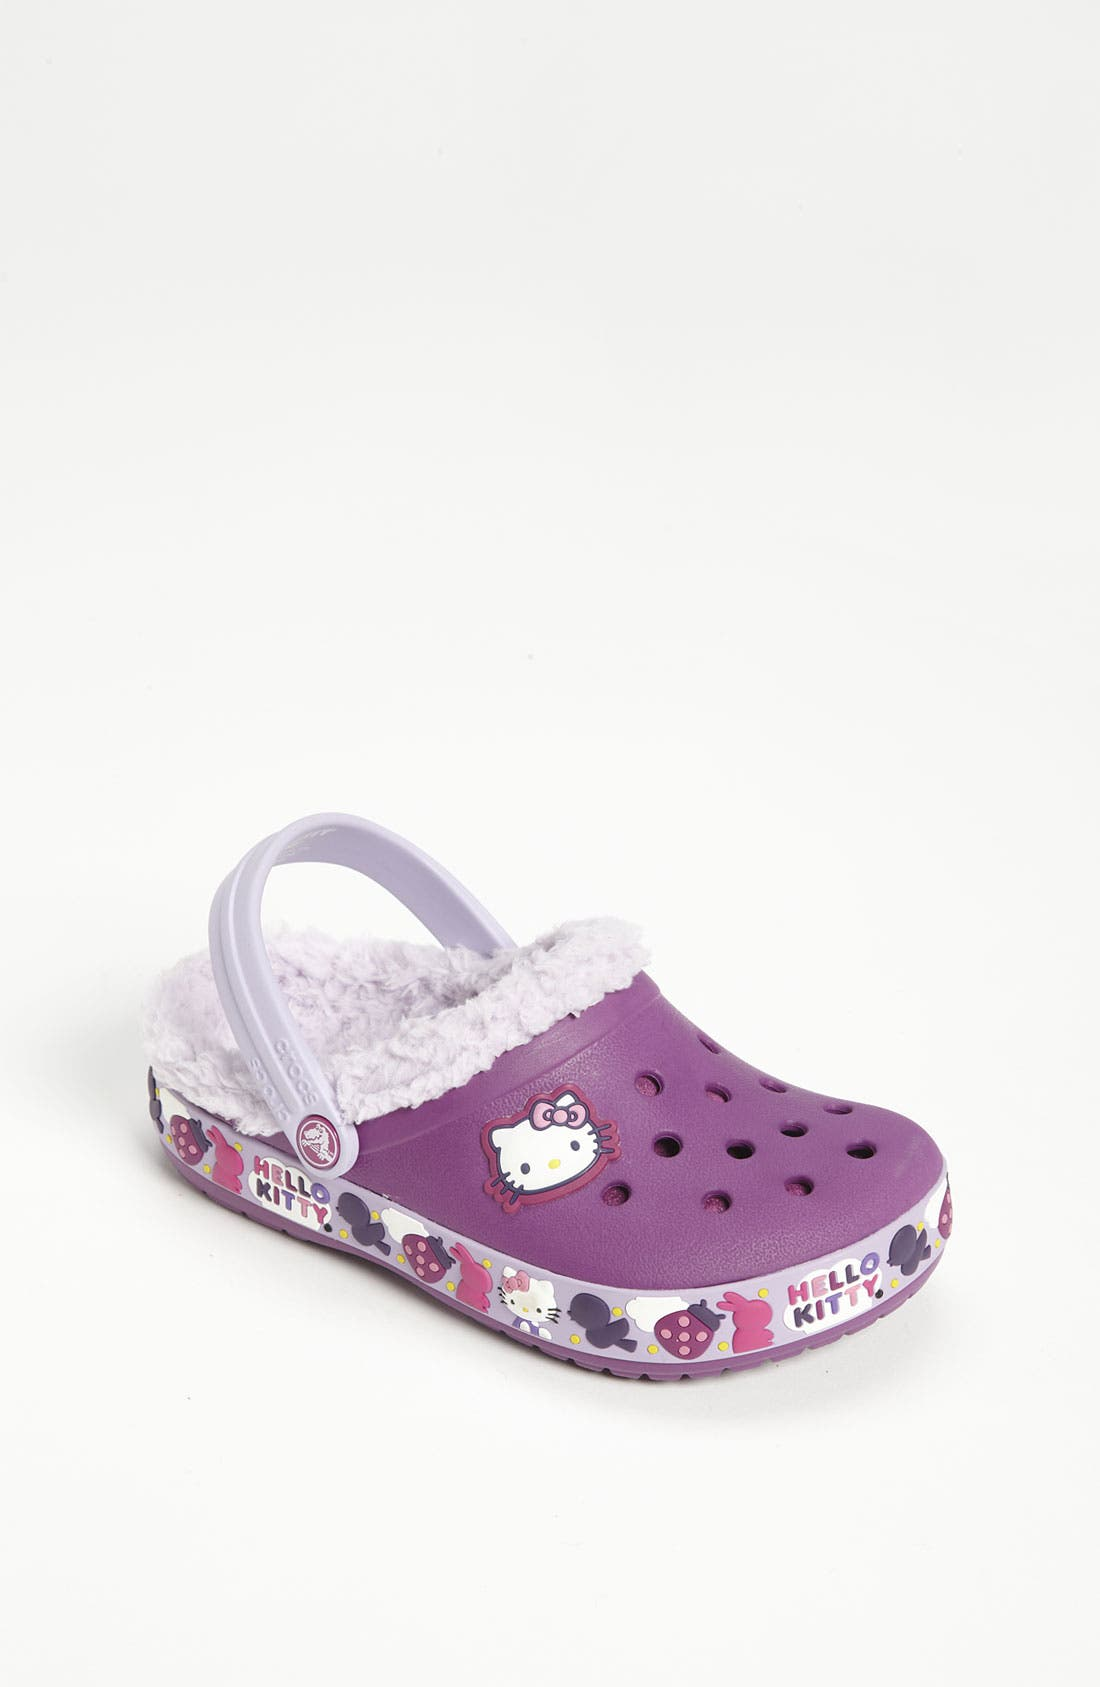 Main Image - CROCS™ 'Hello Kitty®' Slip-On (Walker & Toddler)